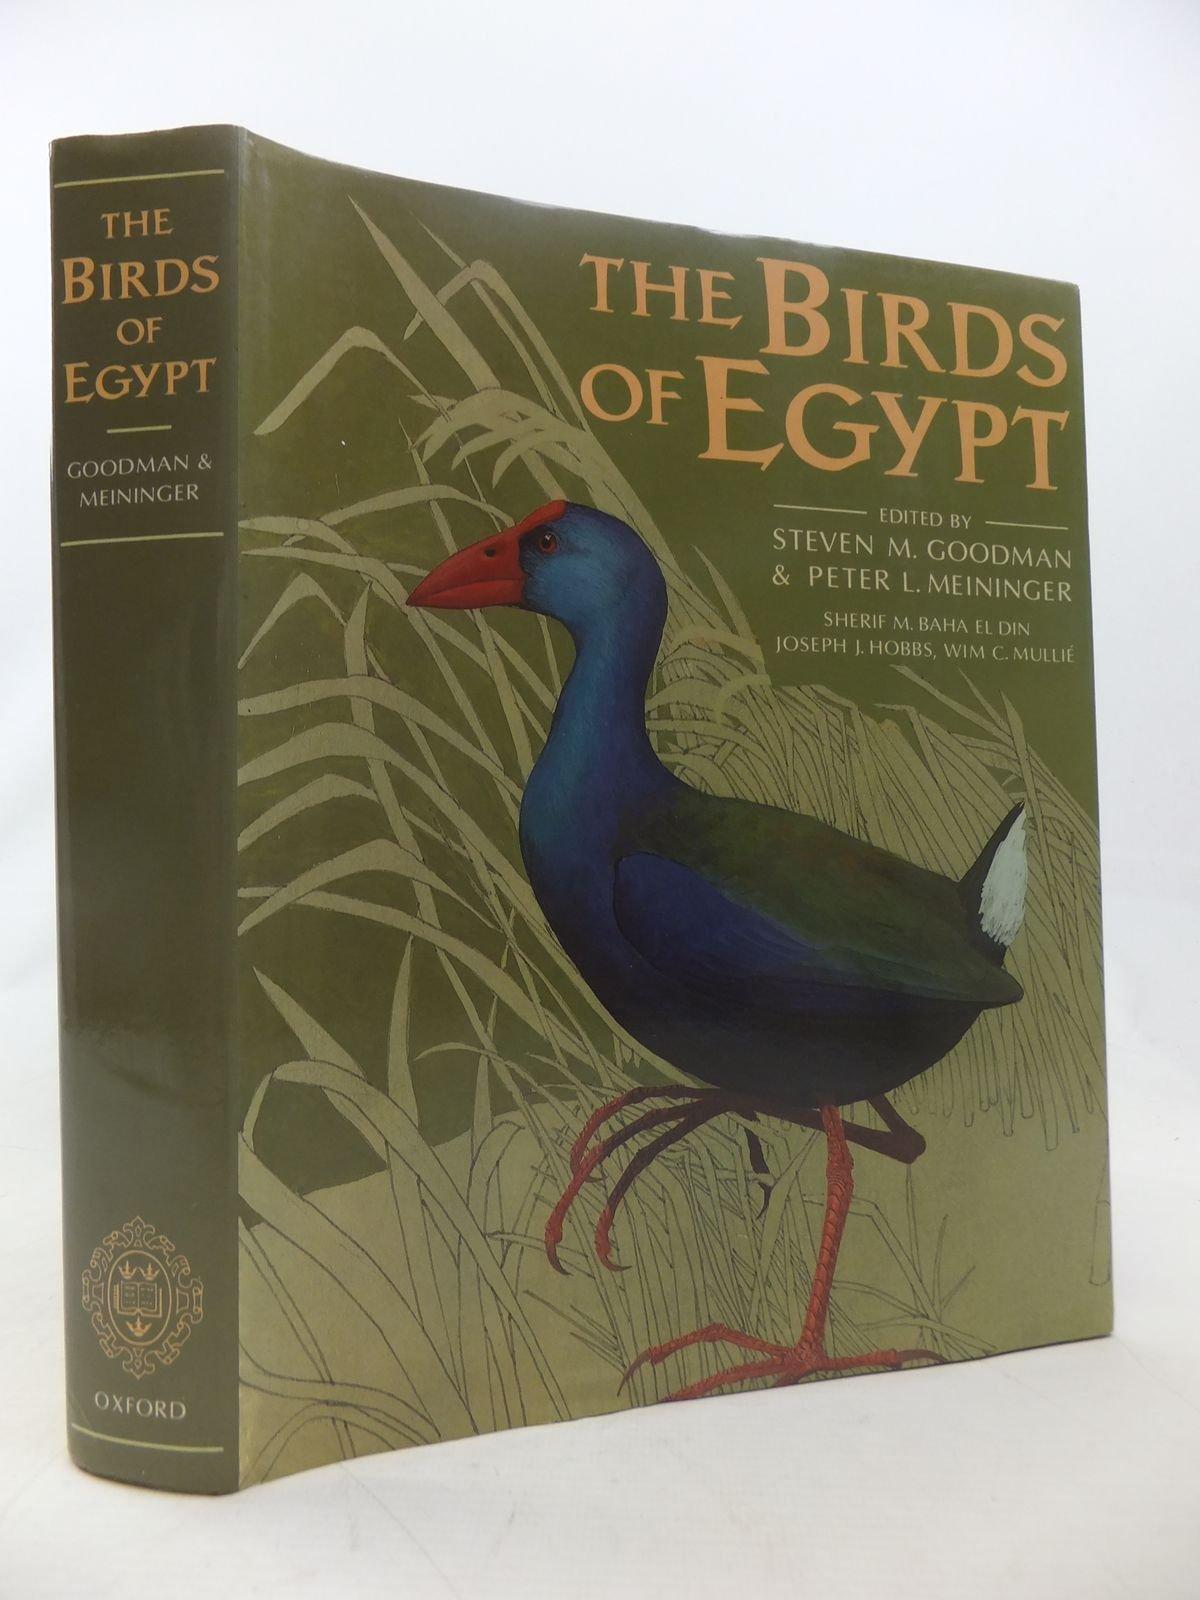 The Birds of Egypt